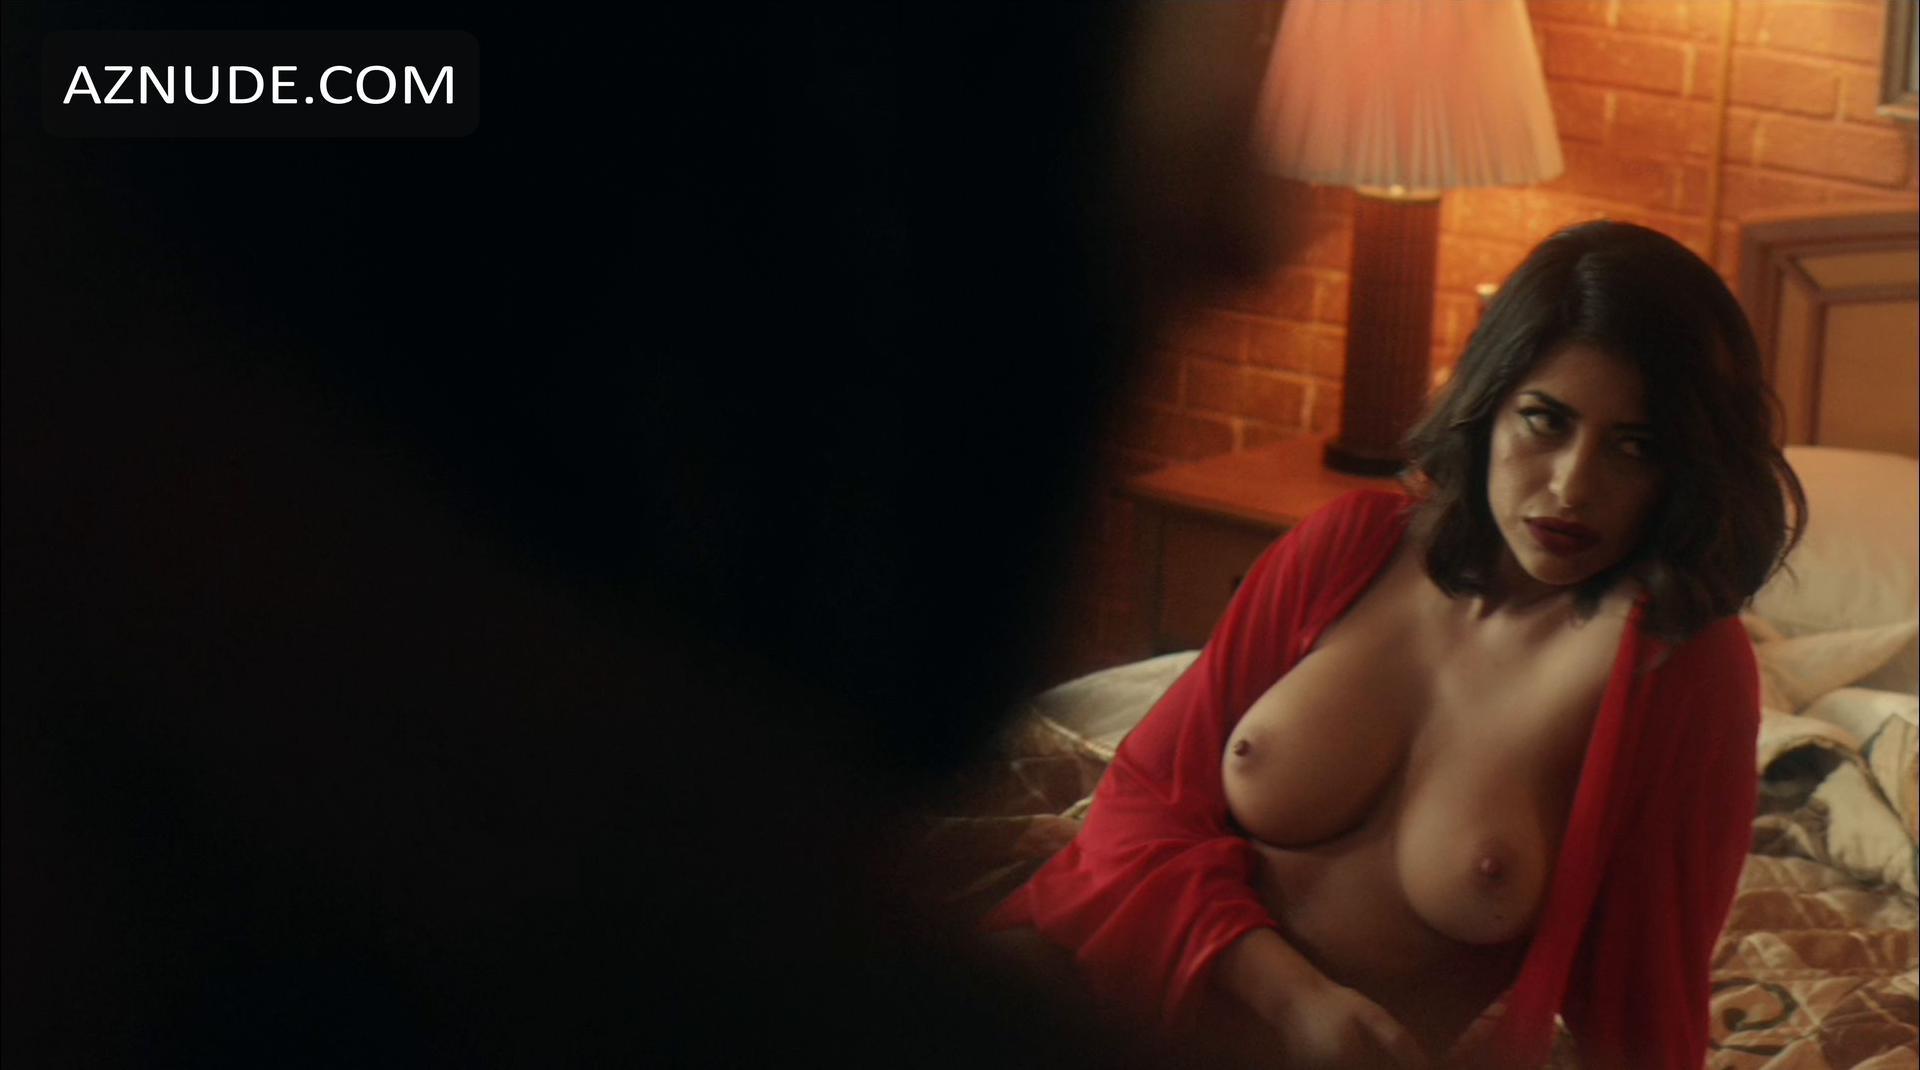 Mila Kunis Naps In A Bikini,Addison Timlin Ass Hot pictures Nude photo of lea michele,FUNNY Mika Brzezinski